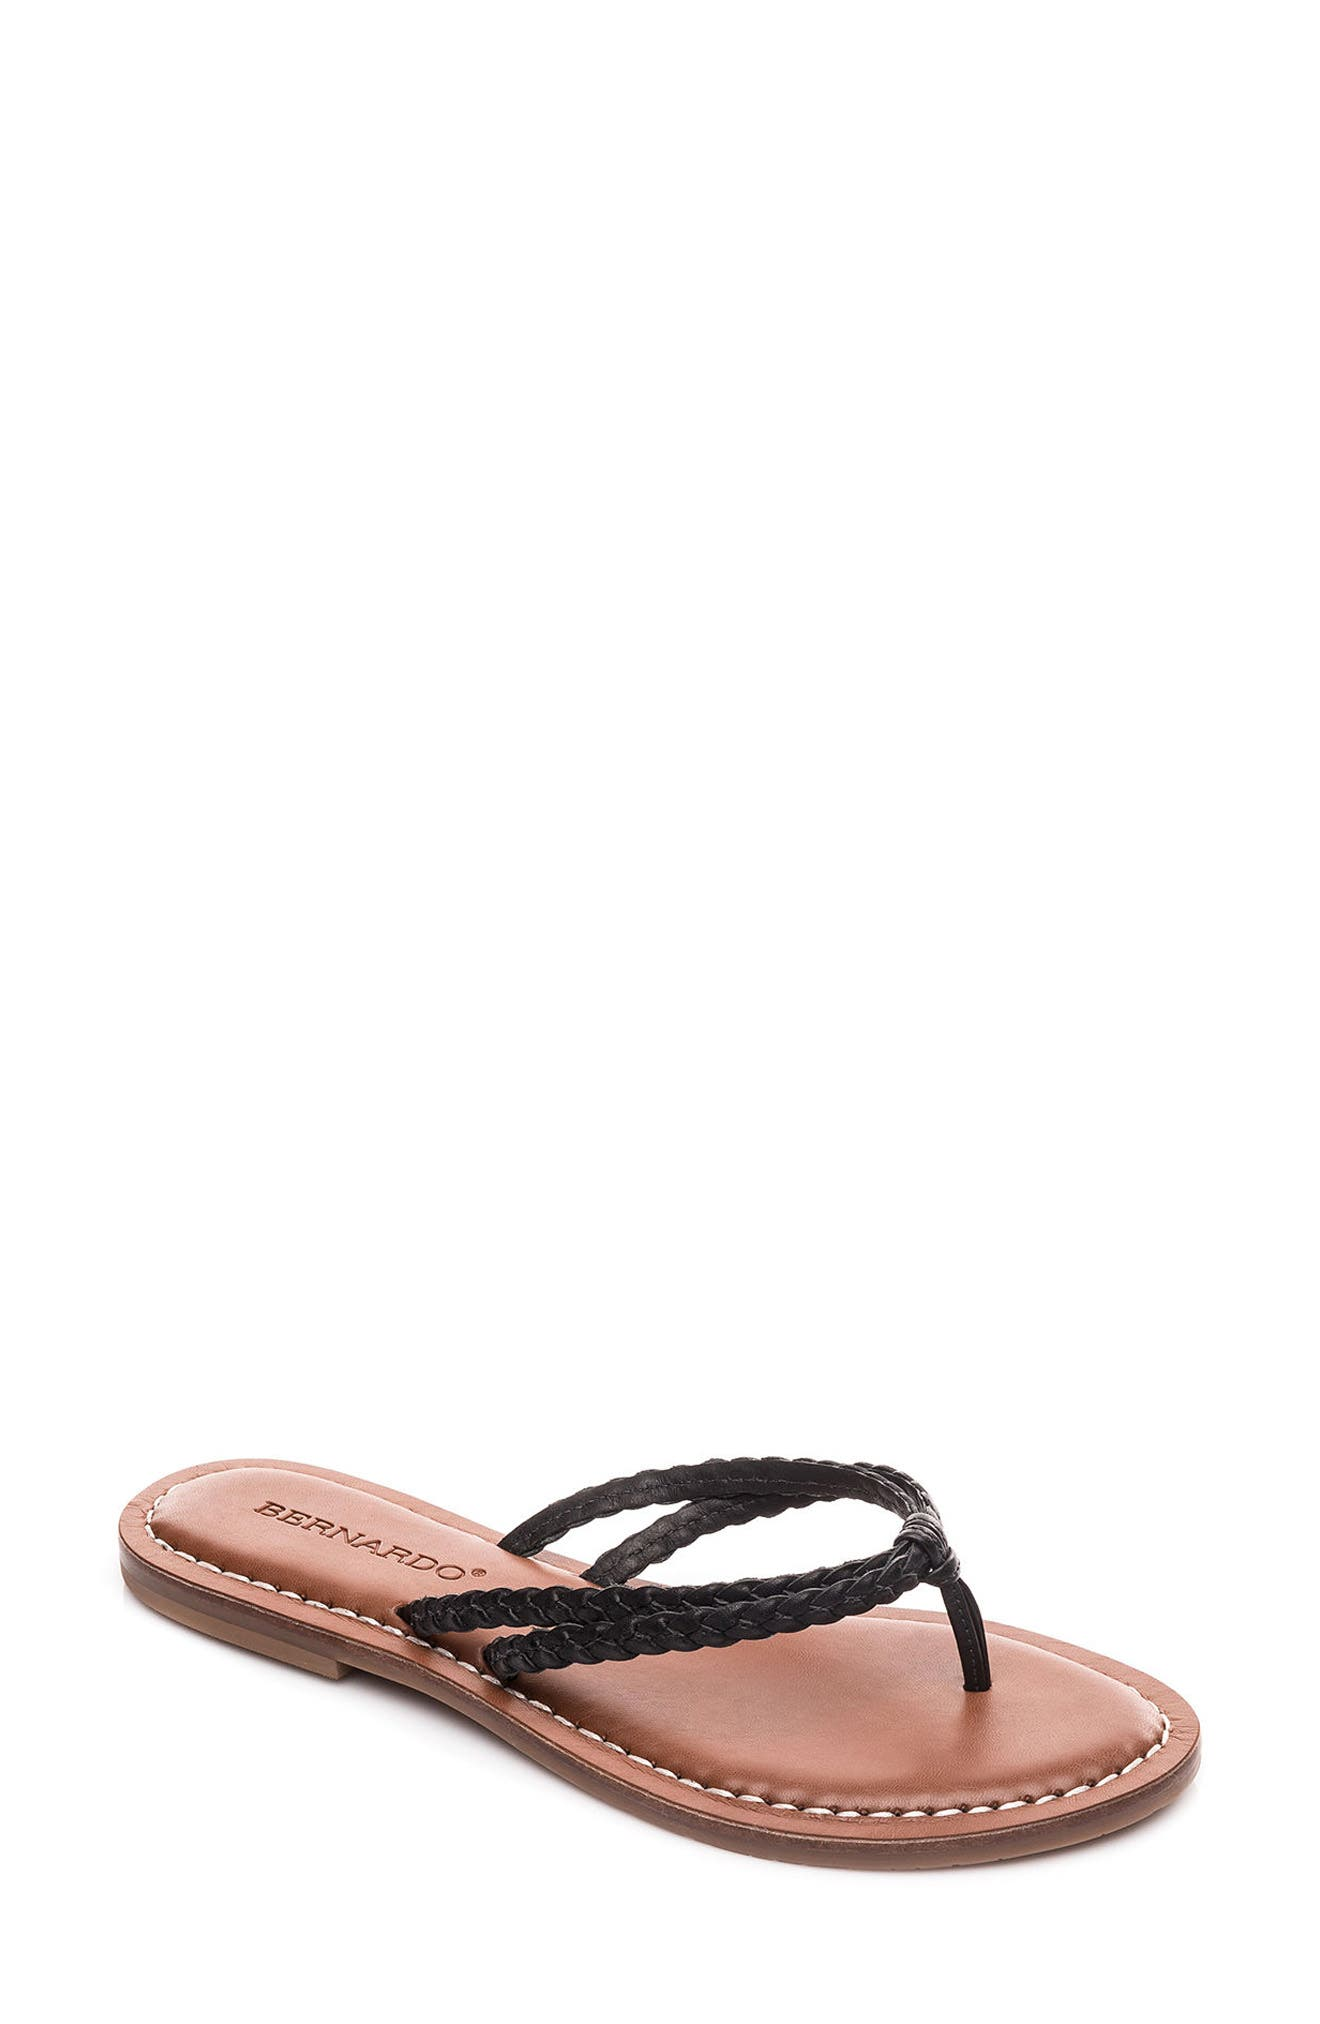 Bernardo Greta Braided Strap Sandal,                         Main,                         color, Black Leather